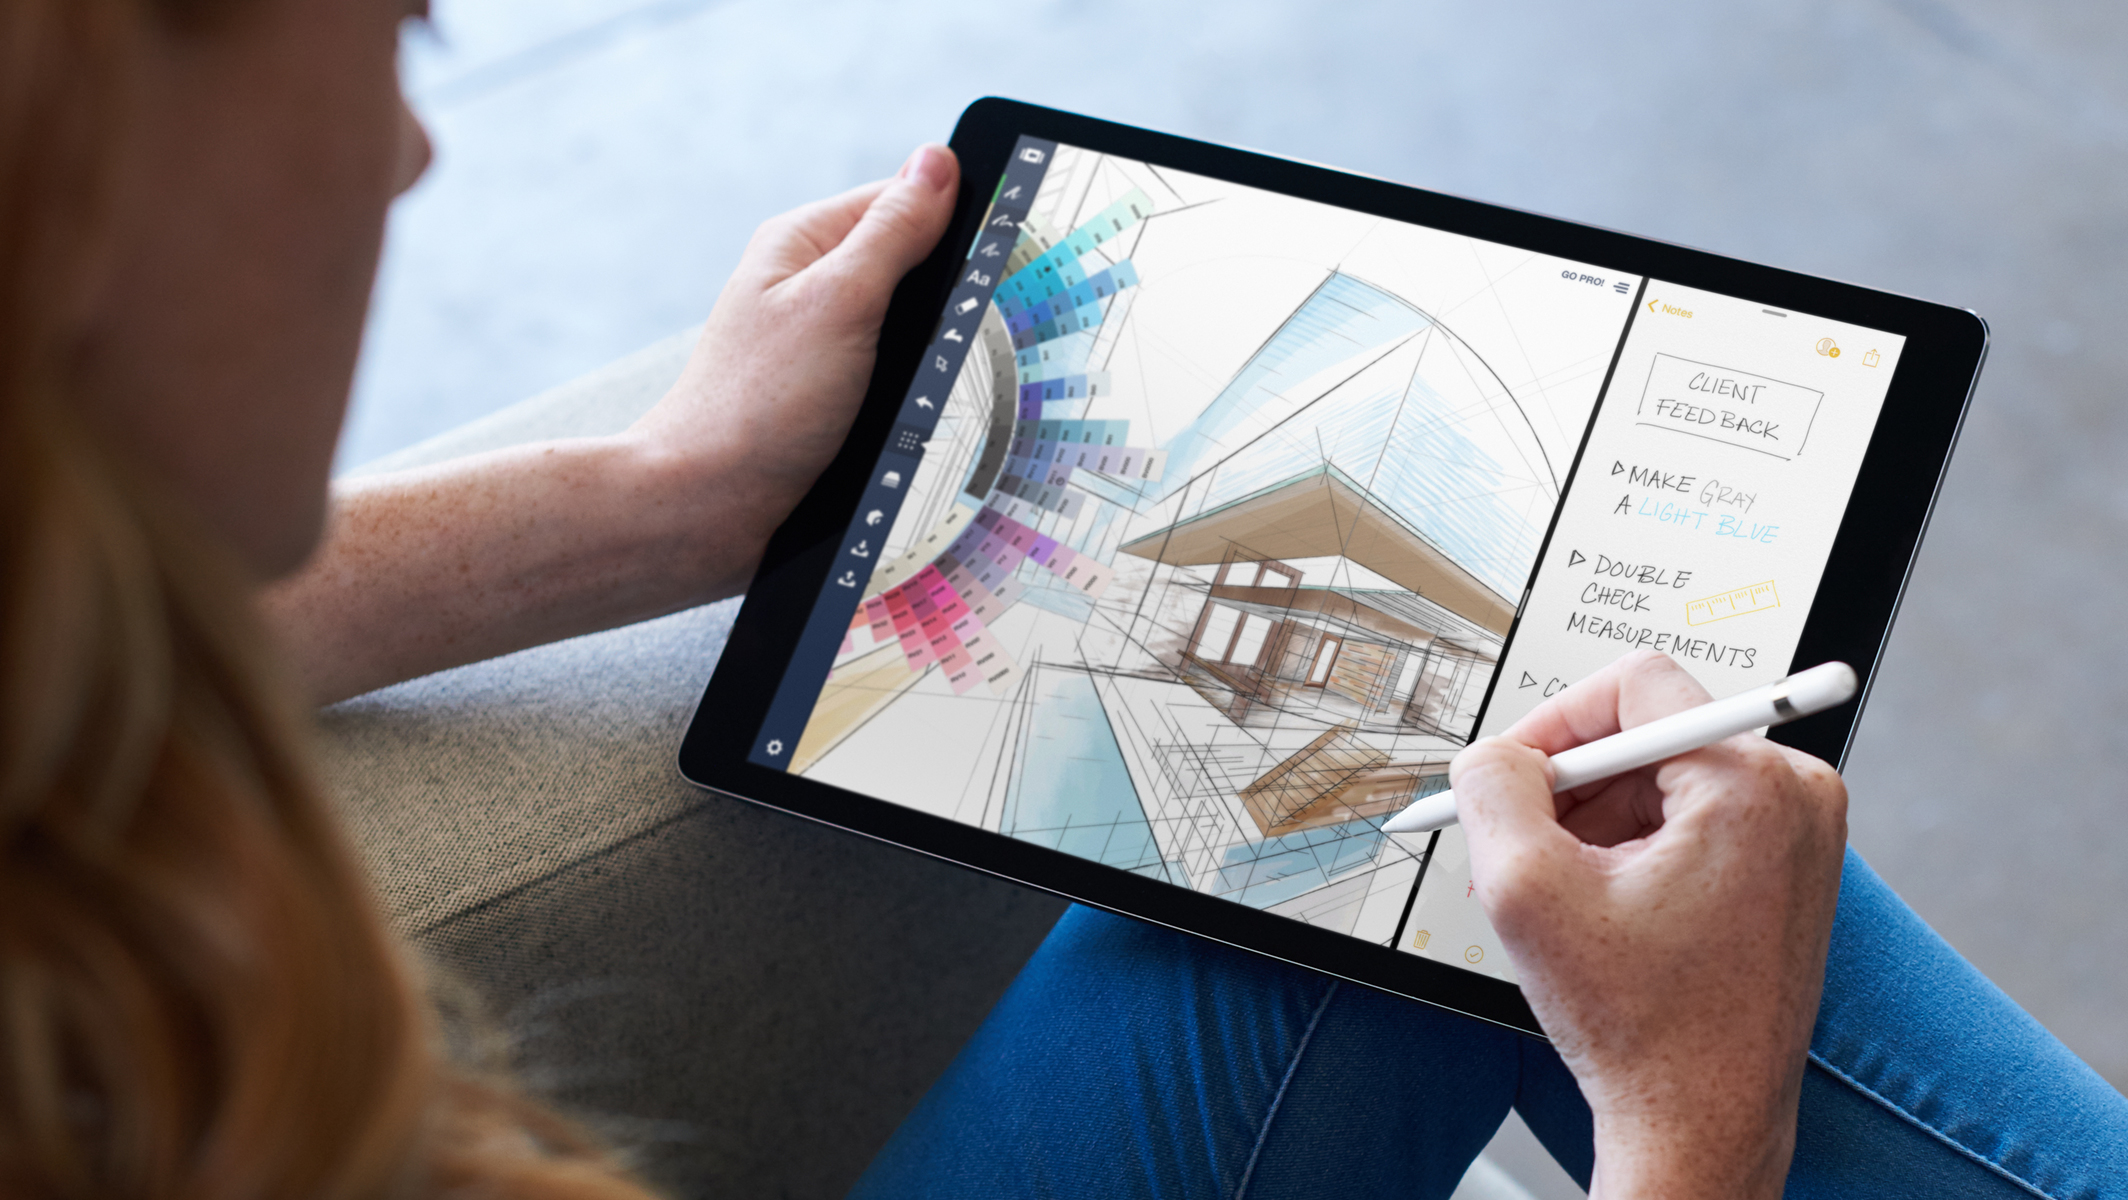 Appple iPad Pro 10.5 inch